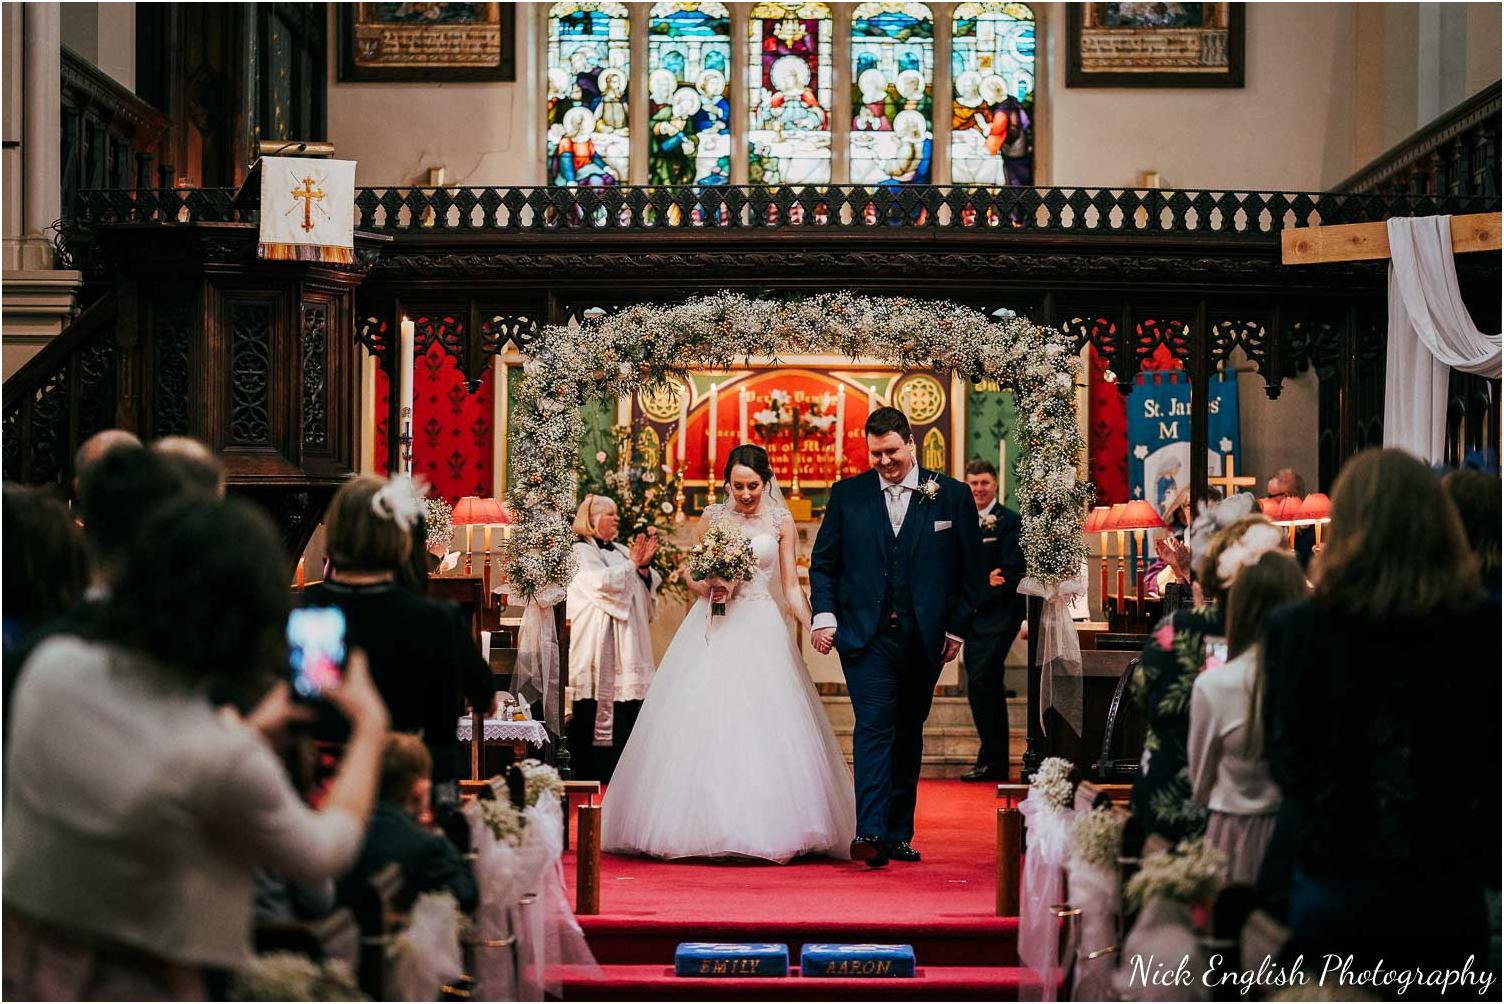 Mitton_Hall_Wedding_Photographer-39.jpg